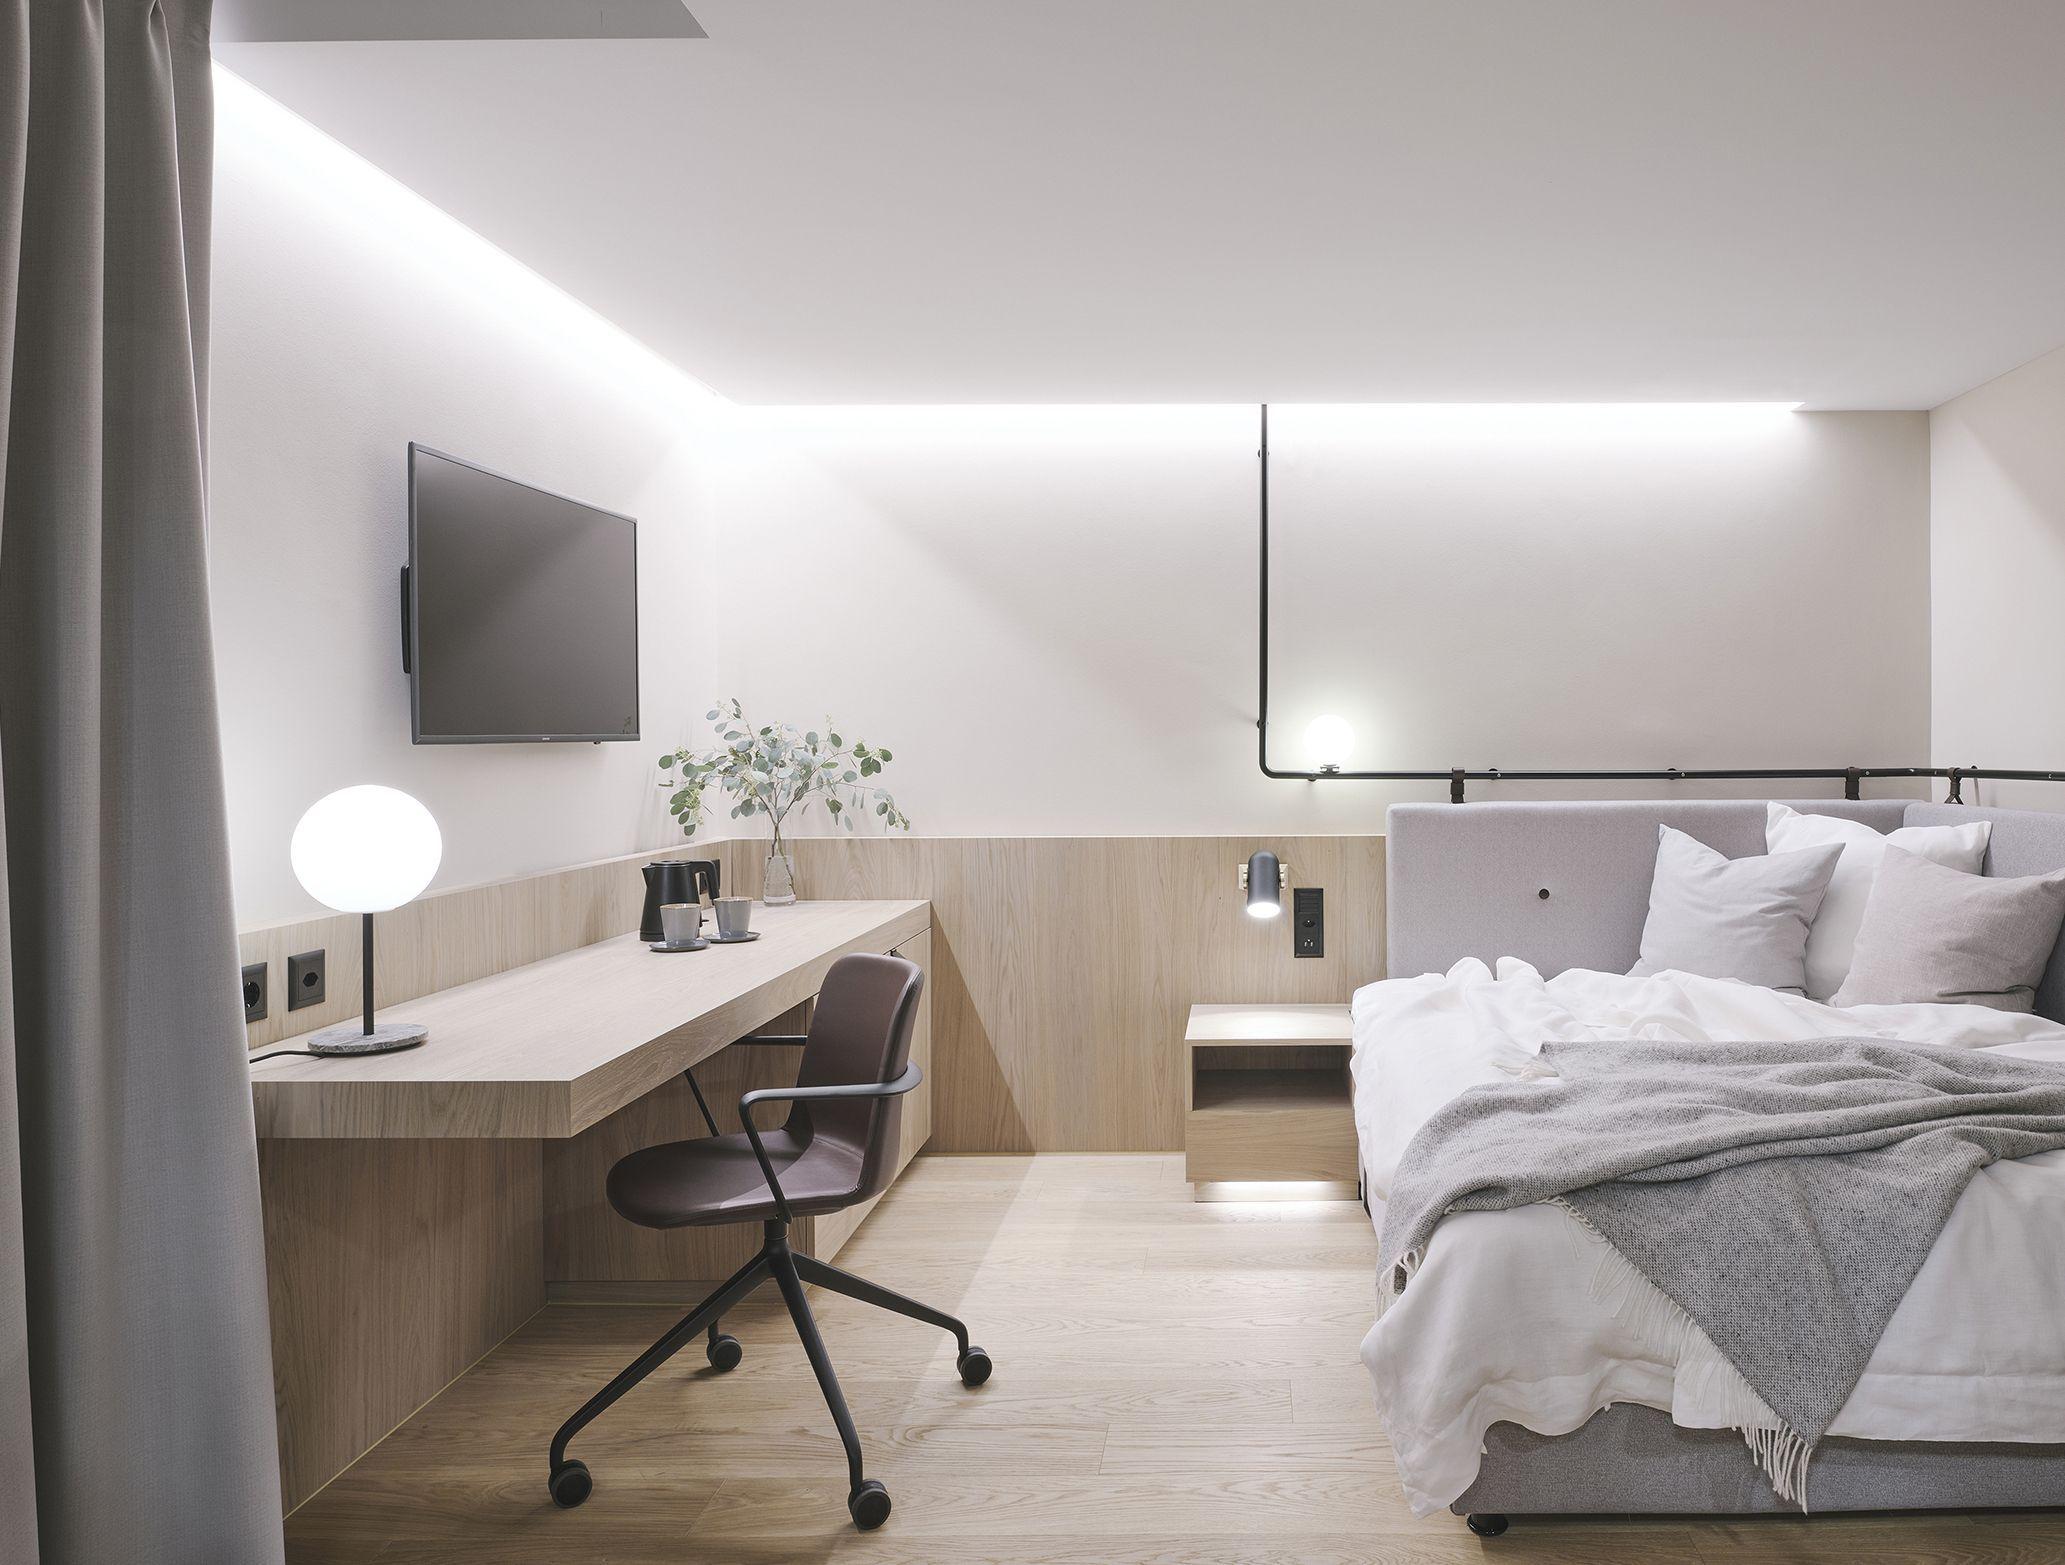 45+ Hotel avec miroir dans la chambre inspirations